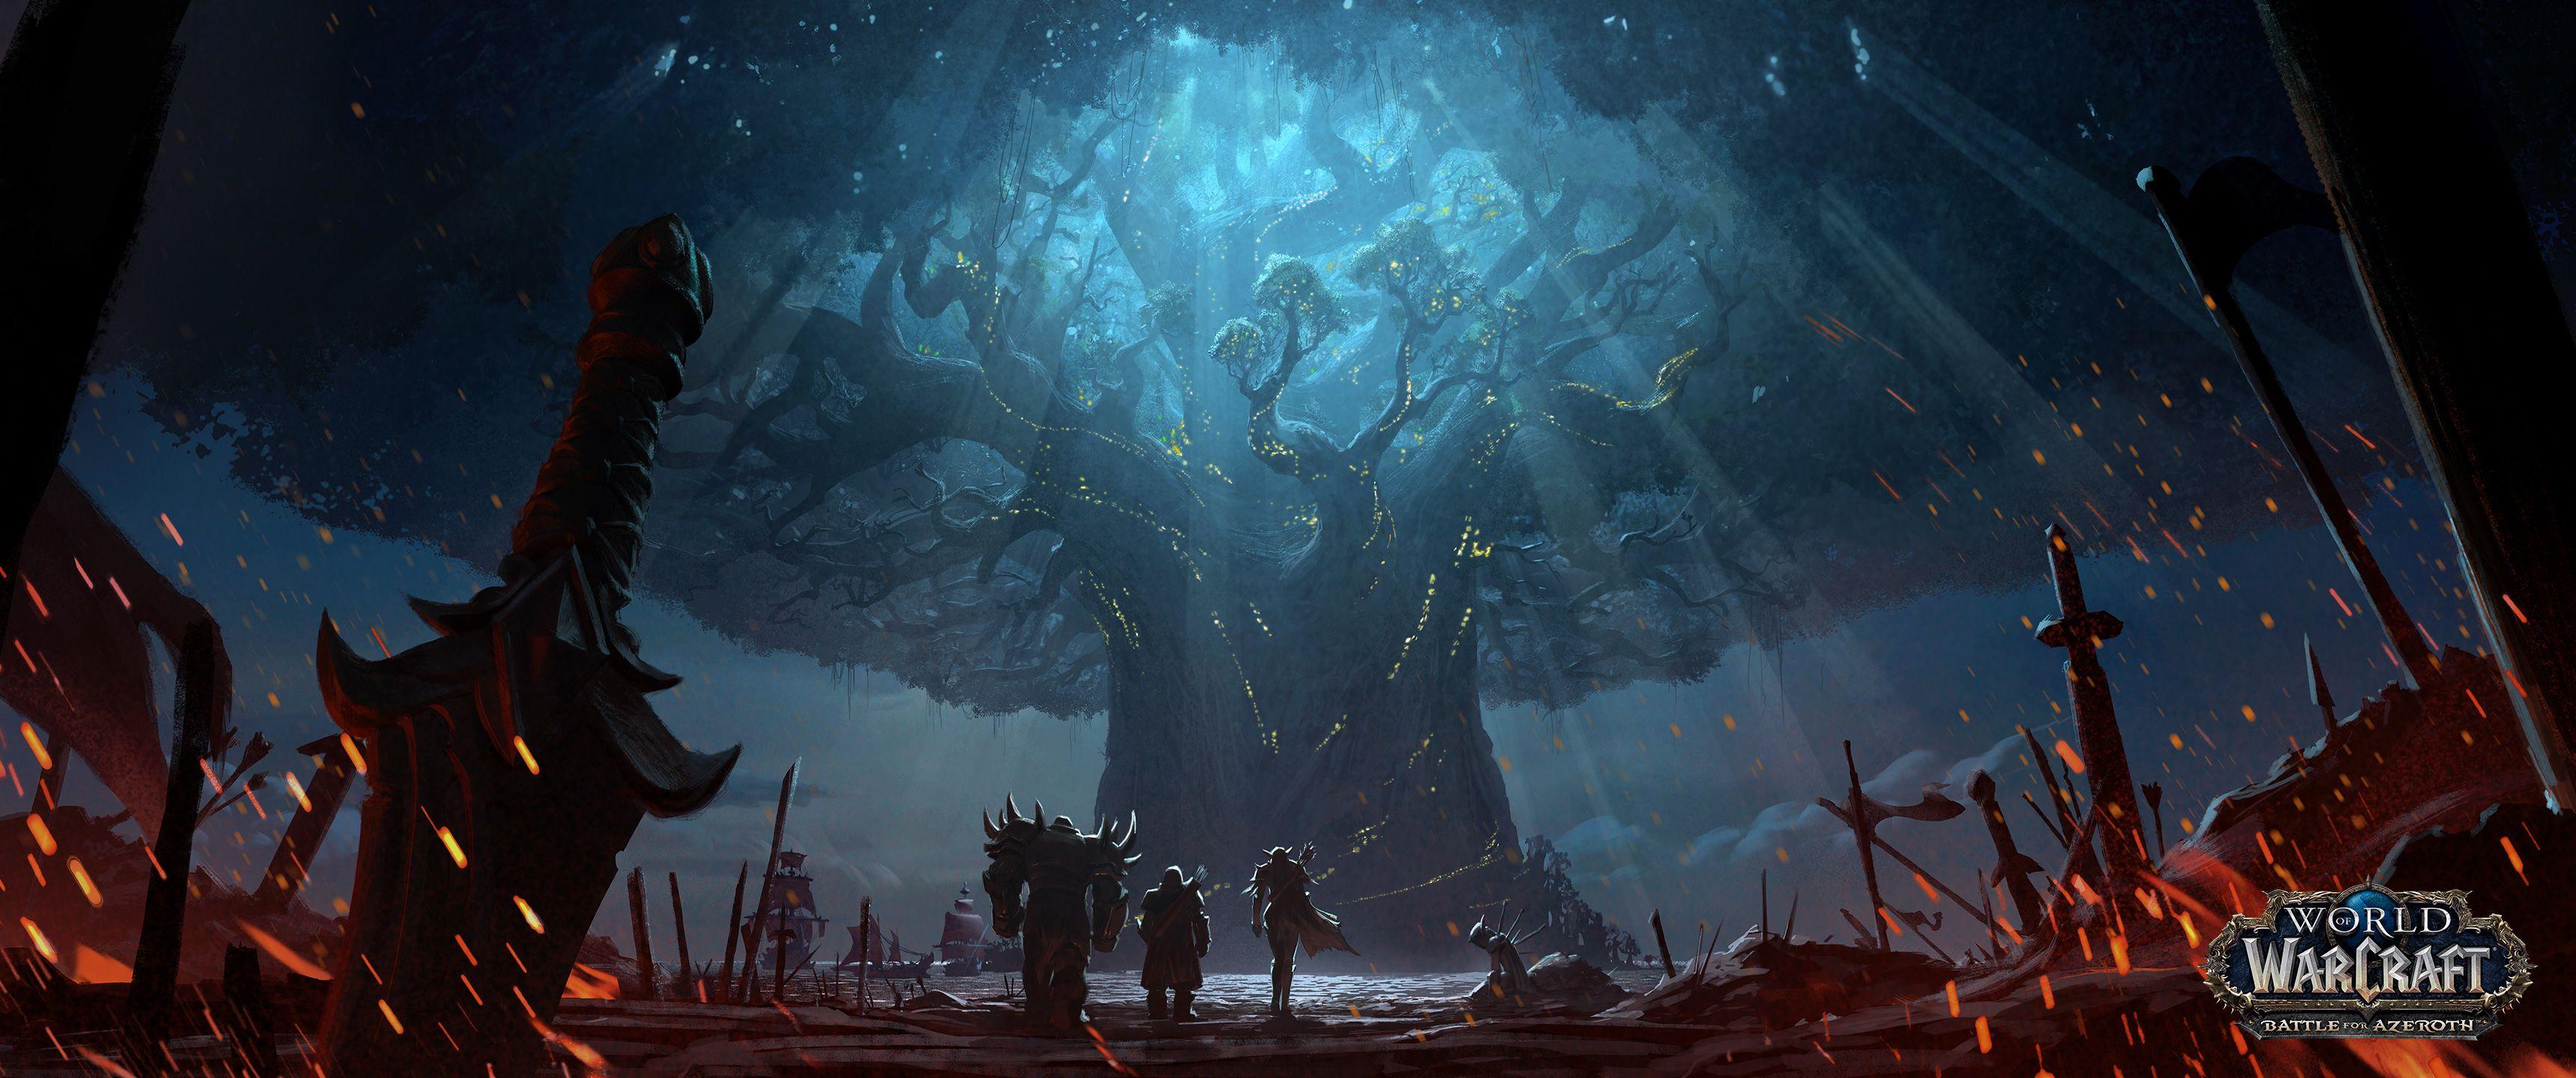 Warcraft Wallpapers   Top Warcraft Backgrounds   WallpaperAccess 3440x1440